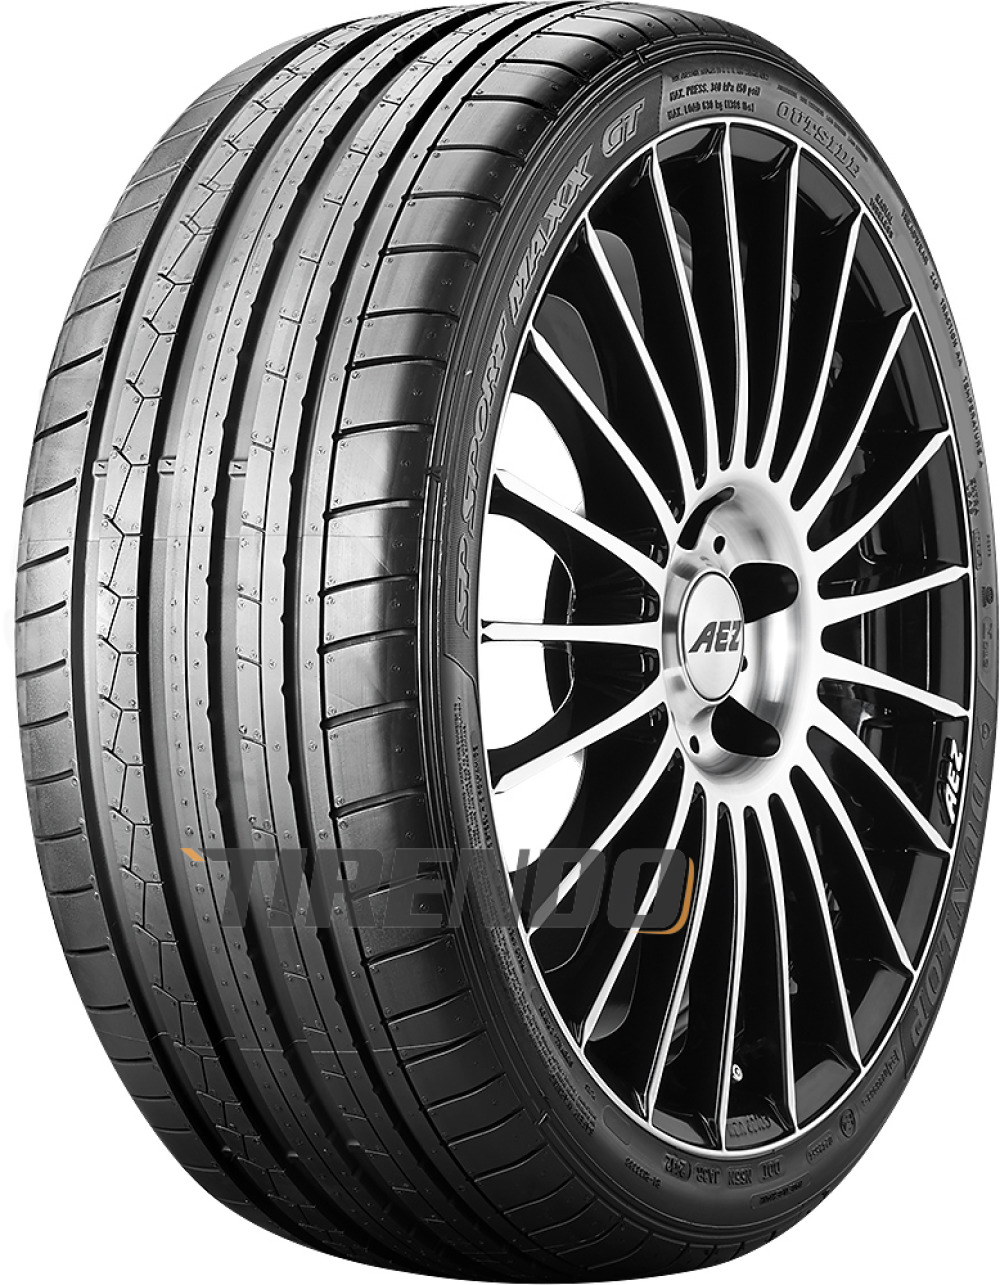 Dunlop SP Sport Maxx GT ( 285/30 ZR21 (100Y) XL NST, RO1 )